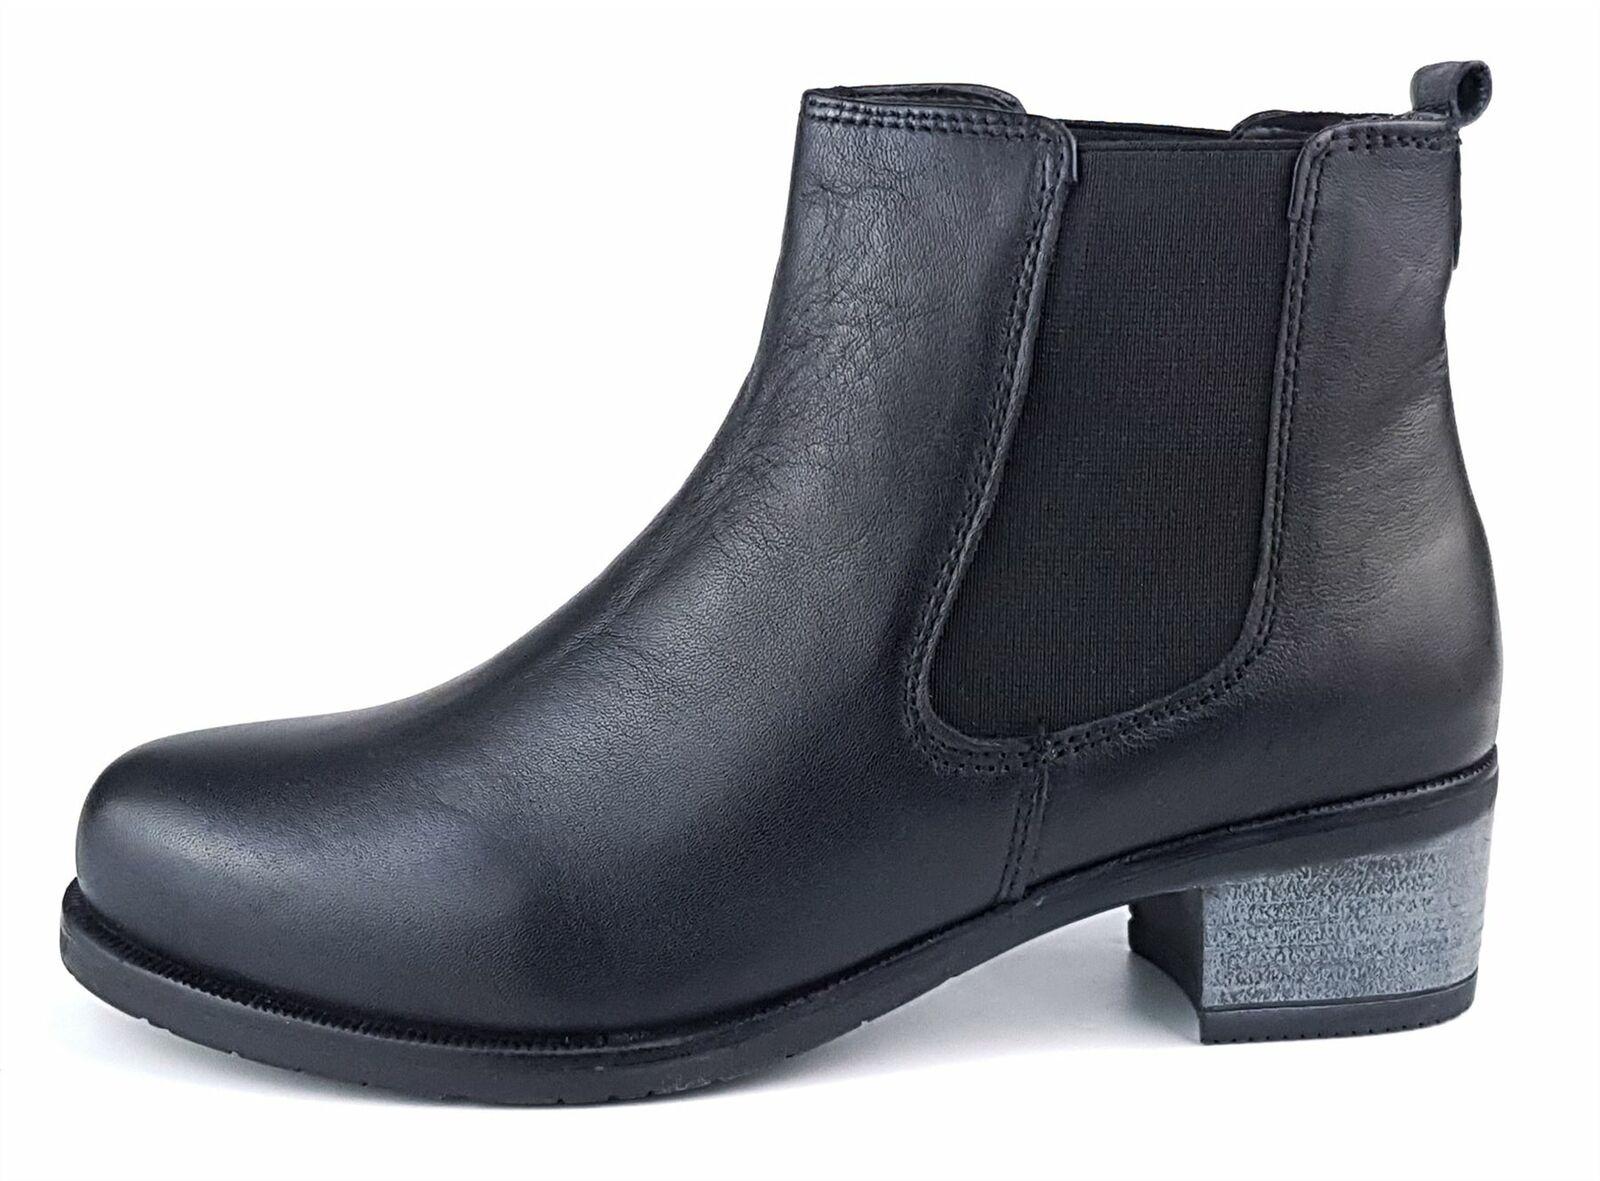 Frank James Towcester Ladies Womans Black Leather Chelsea Pull Ankle Heel Boots 1